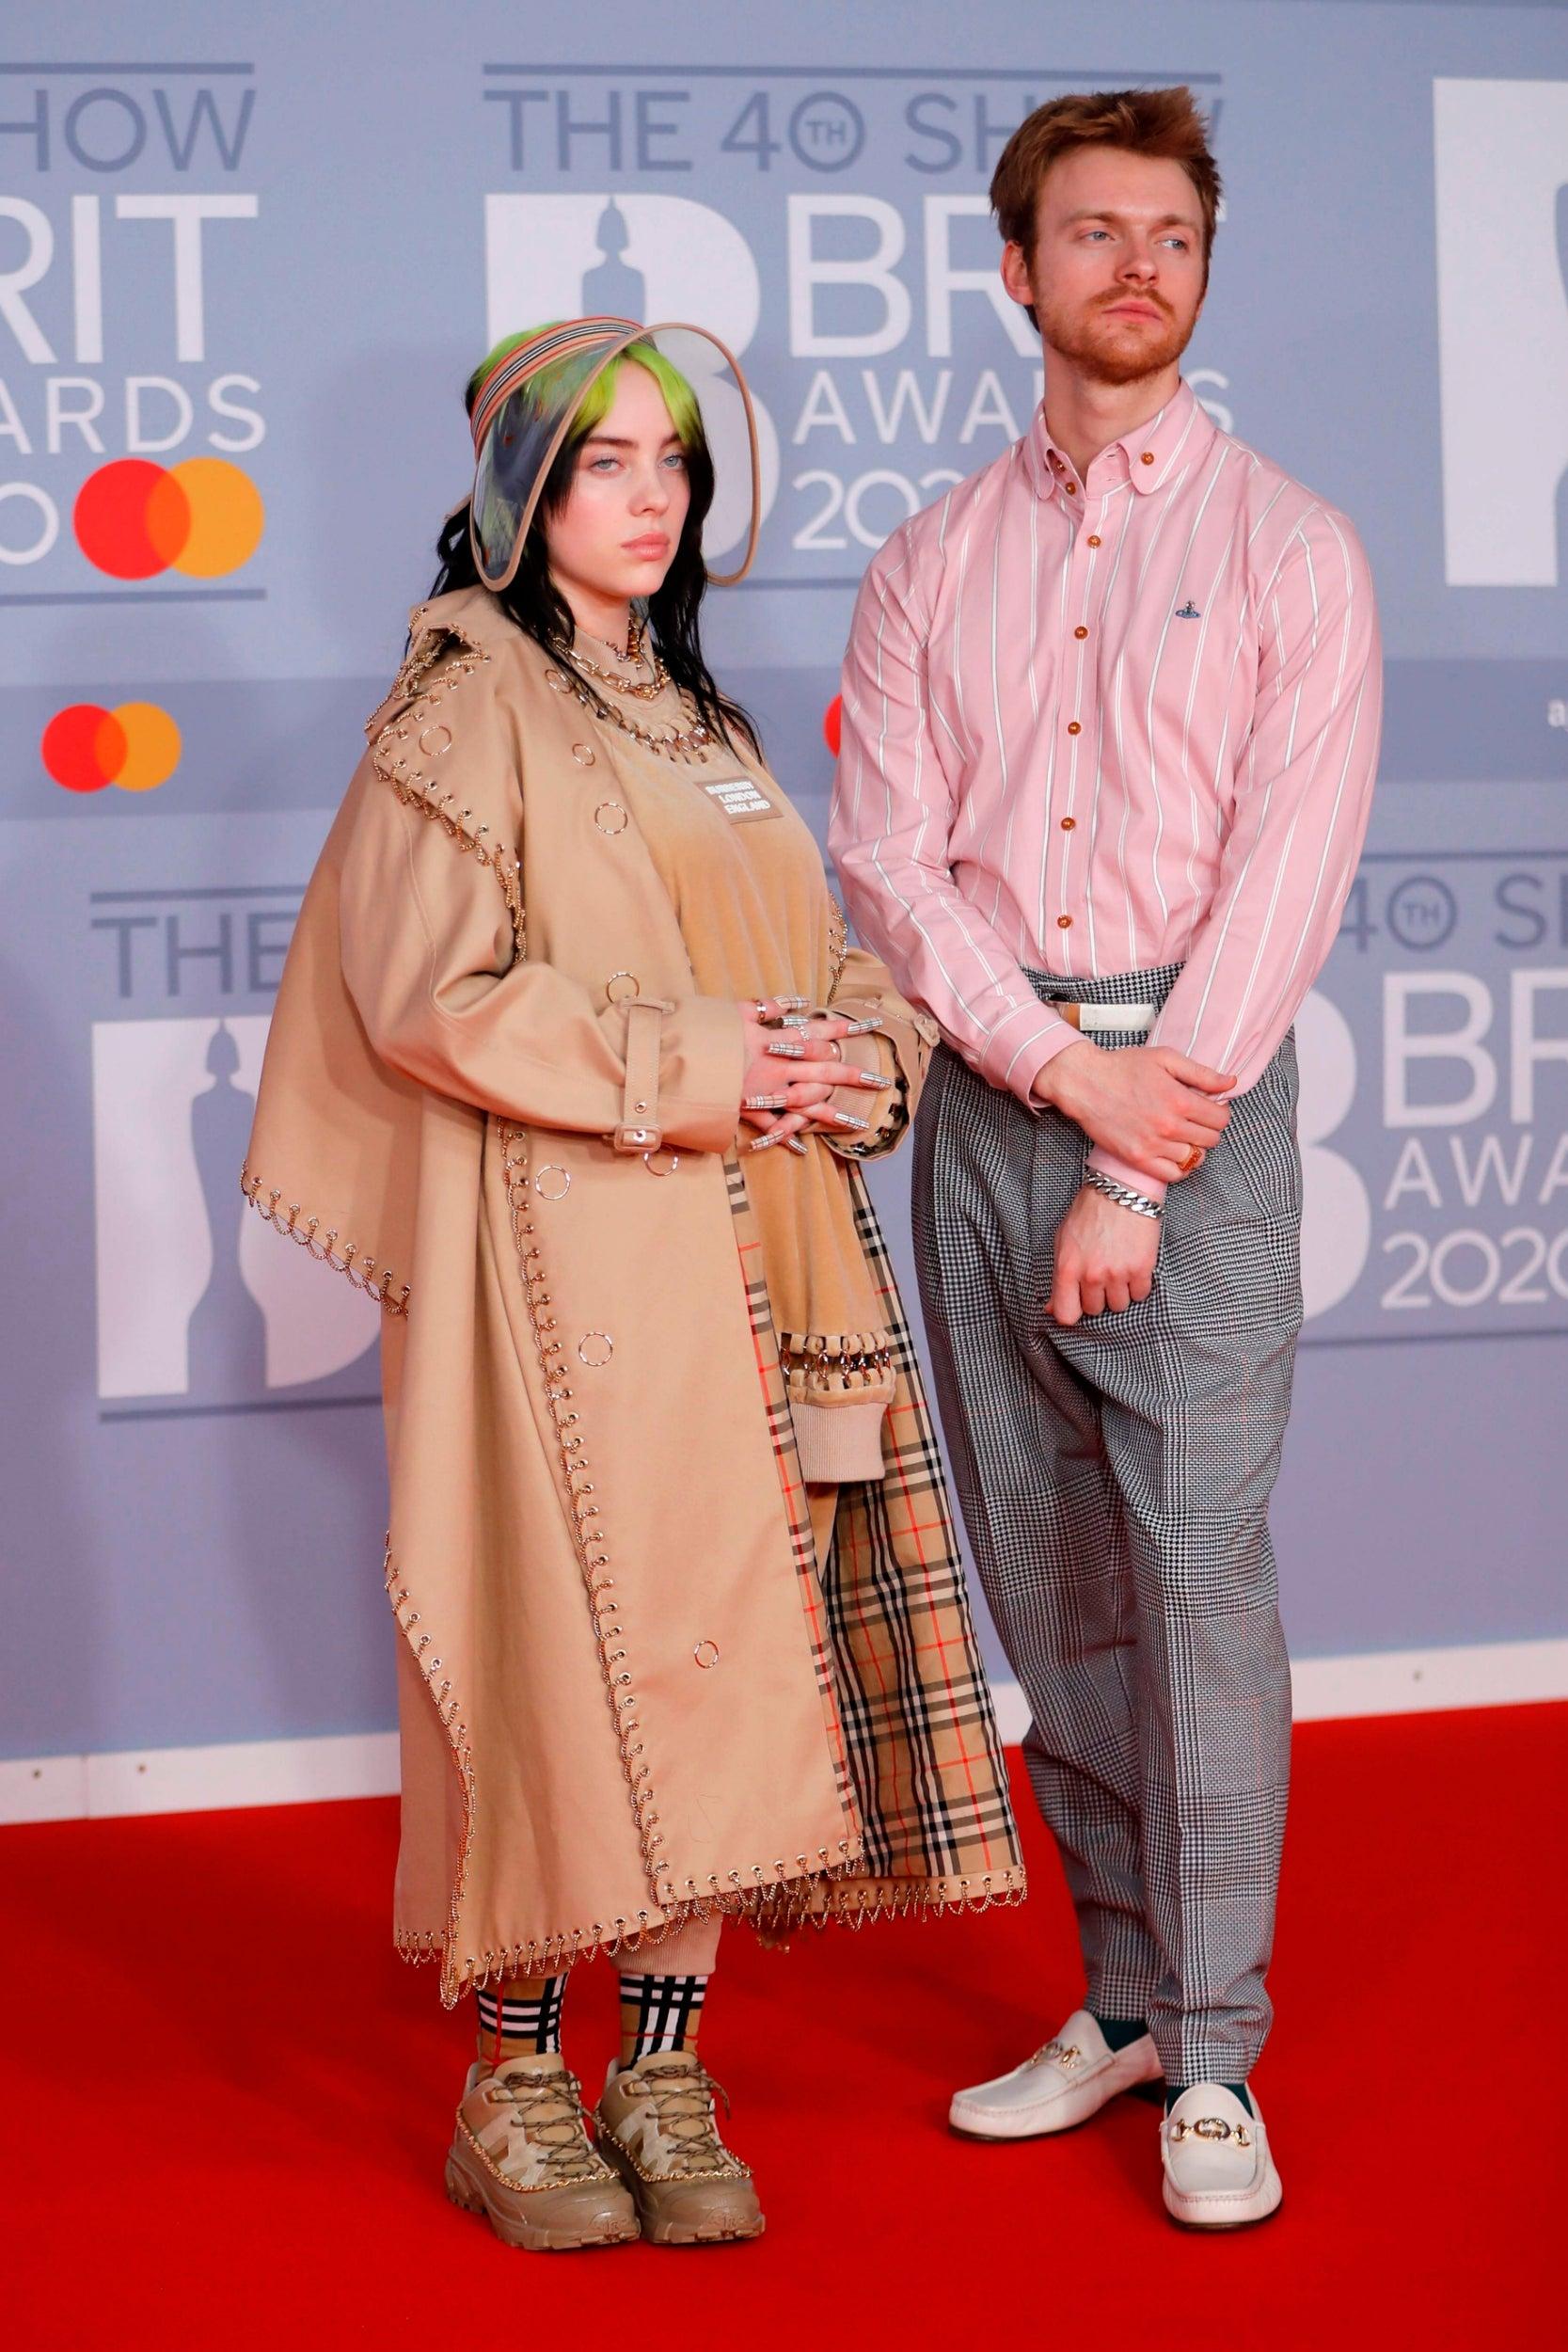 Billie Eilish and Finneas O'Connell